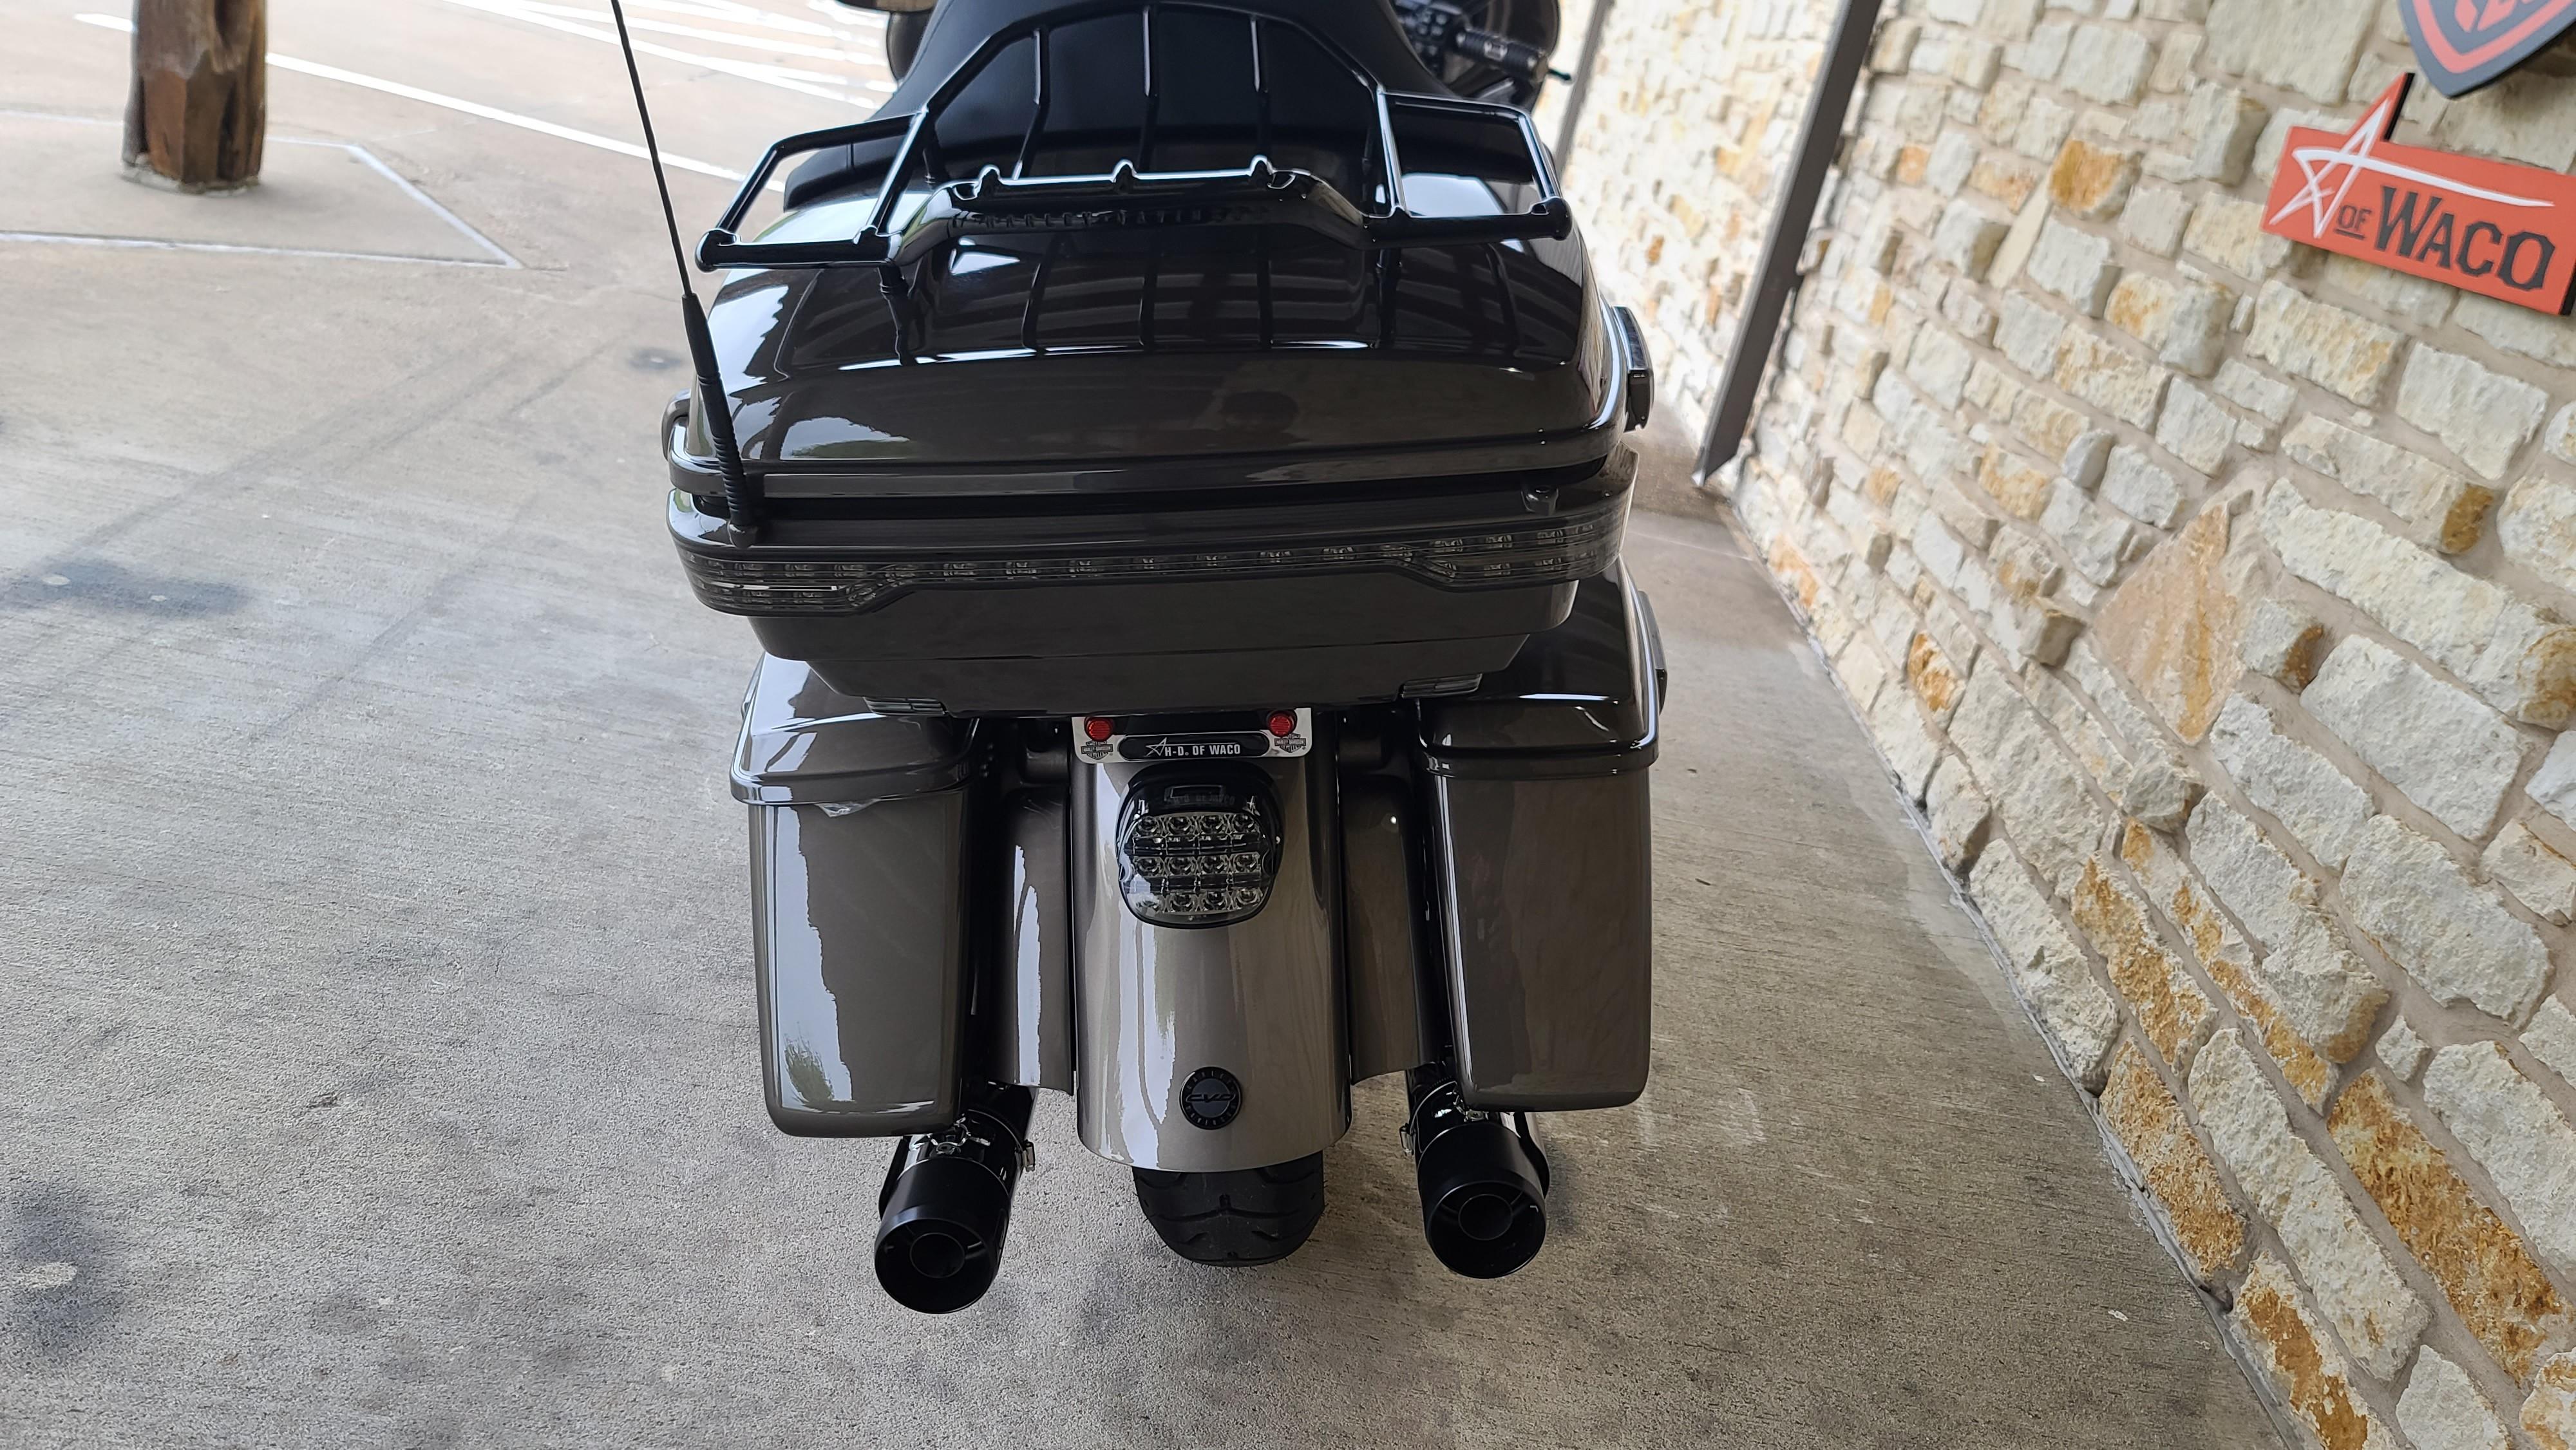 2021 Harley-Davidson Touring FLHTKSE CVO Limited at Harley-Davidson of Waco